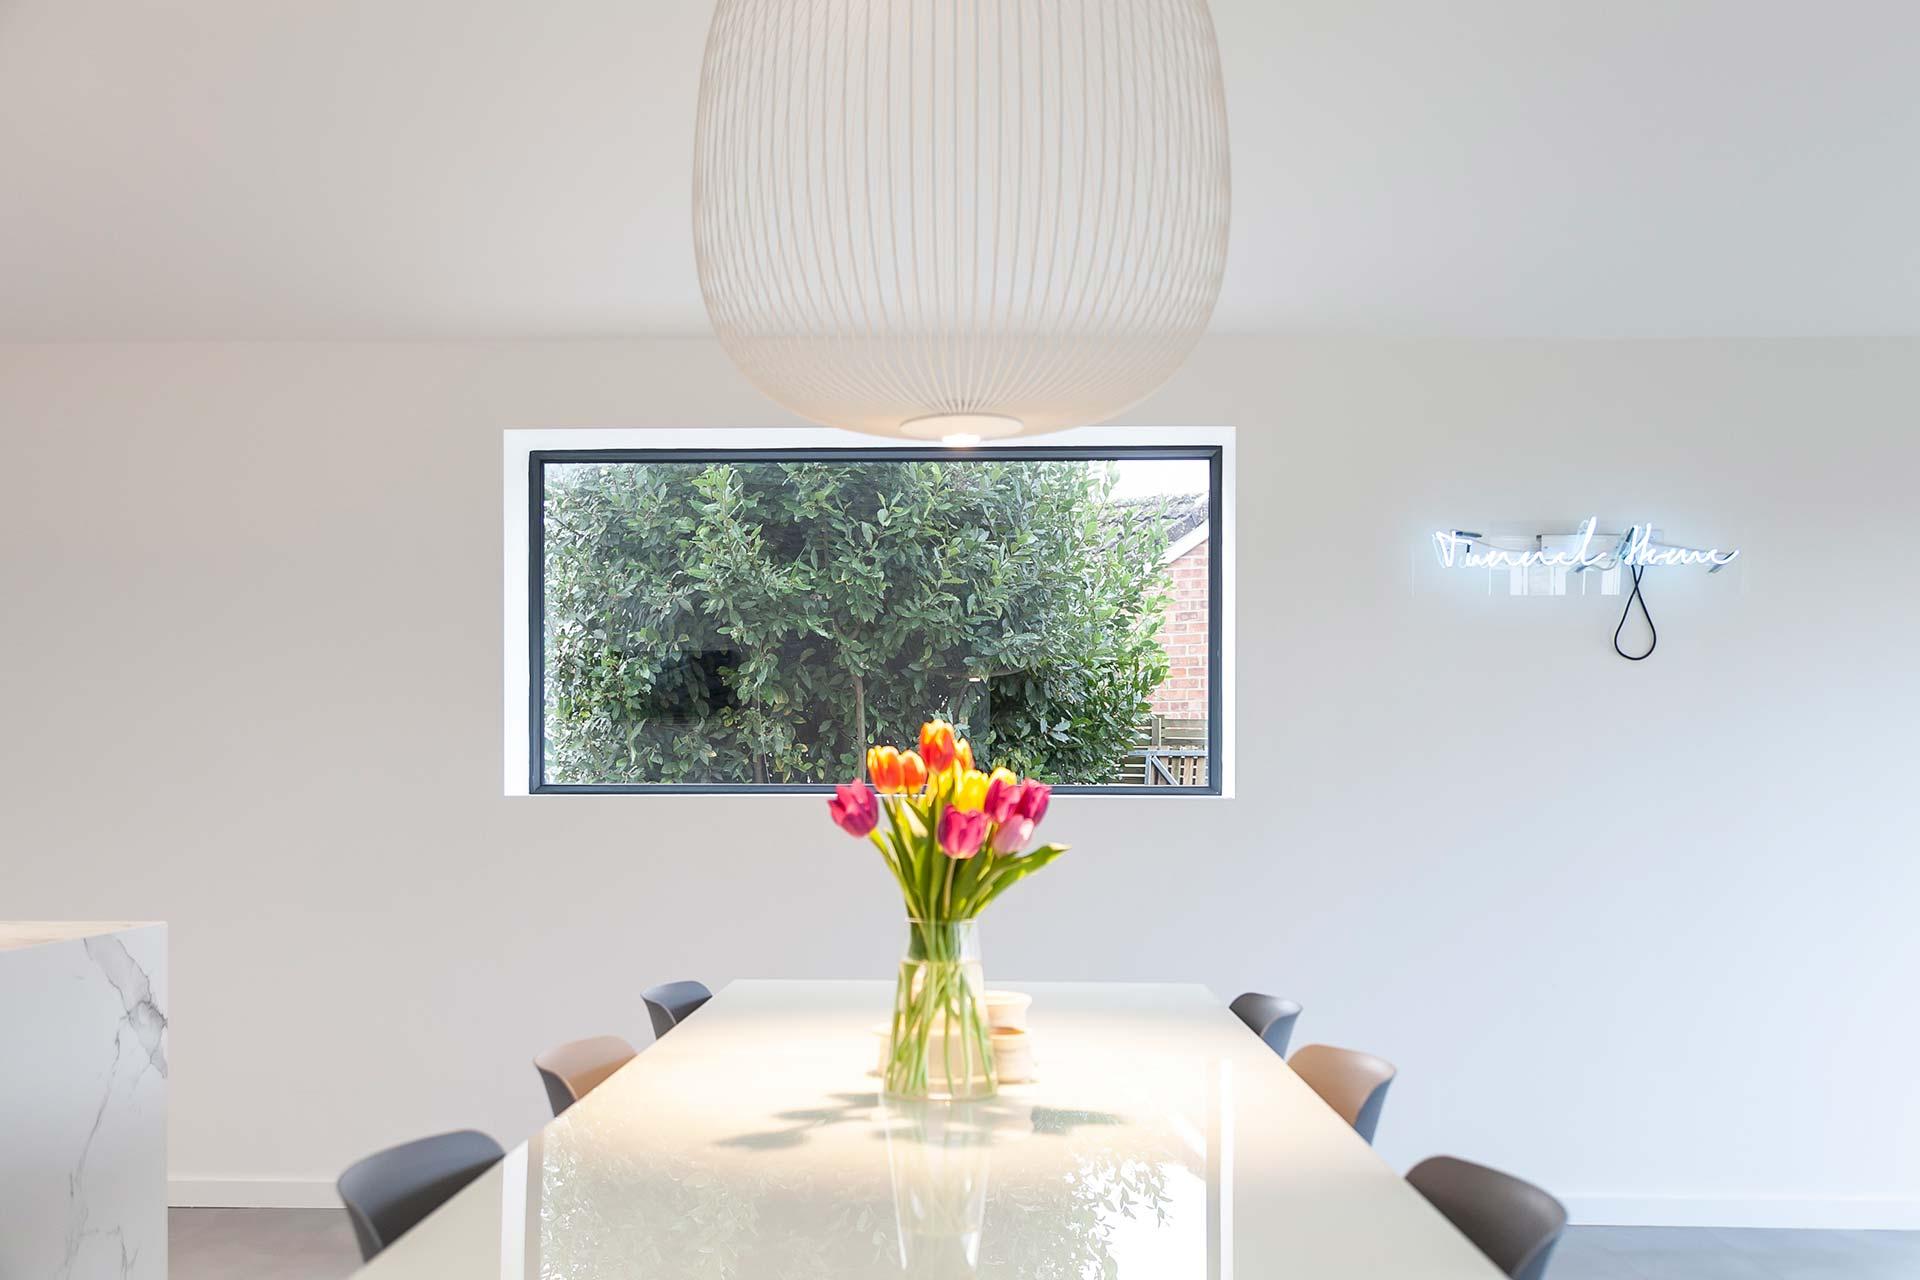 Contemporary Kitchens - Monochrome